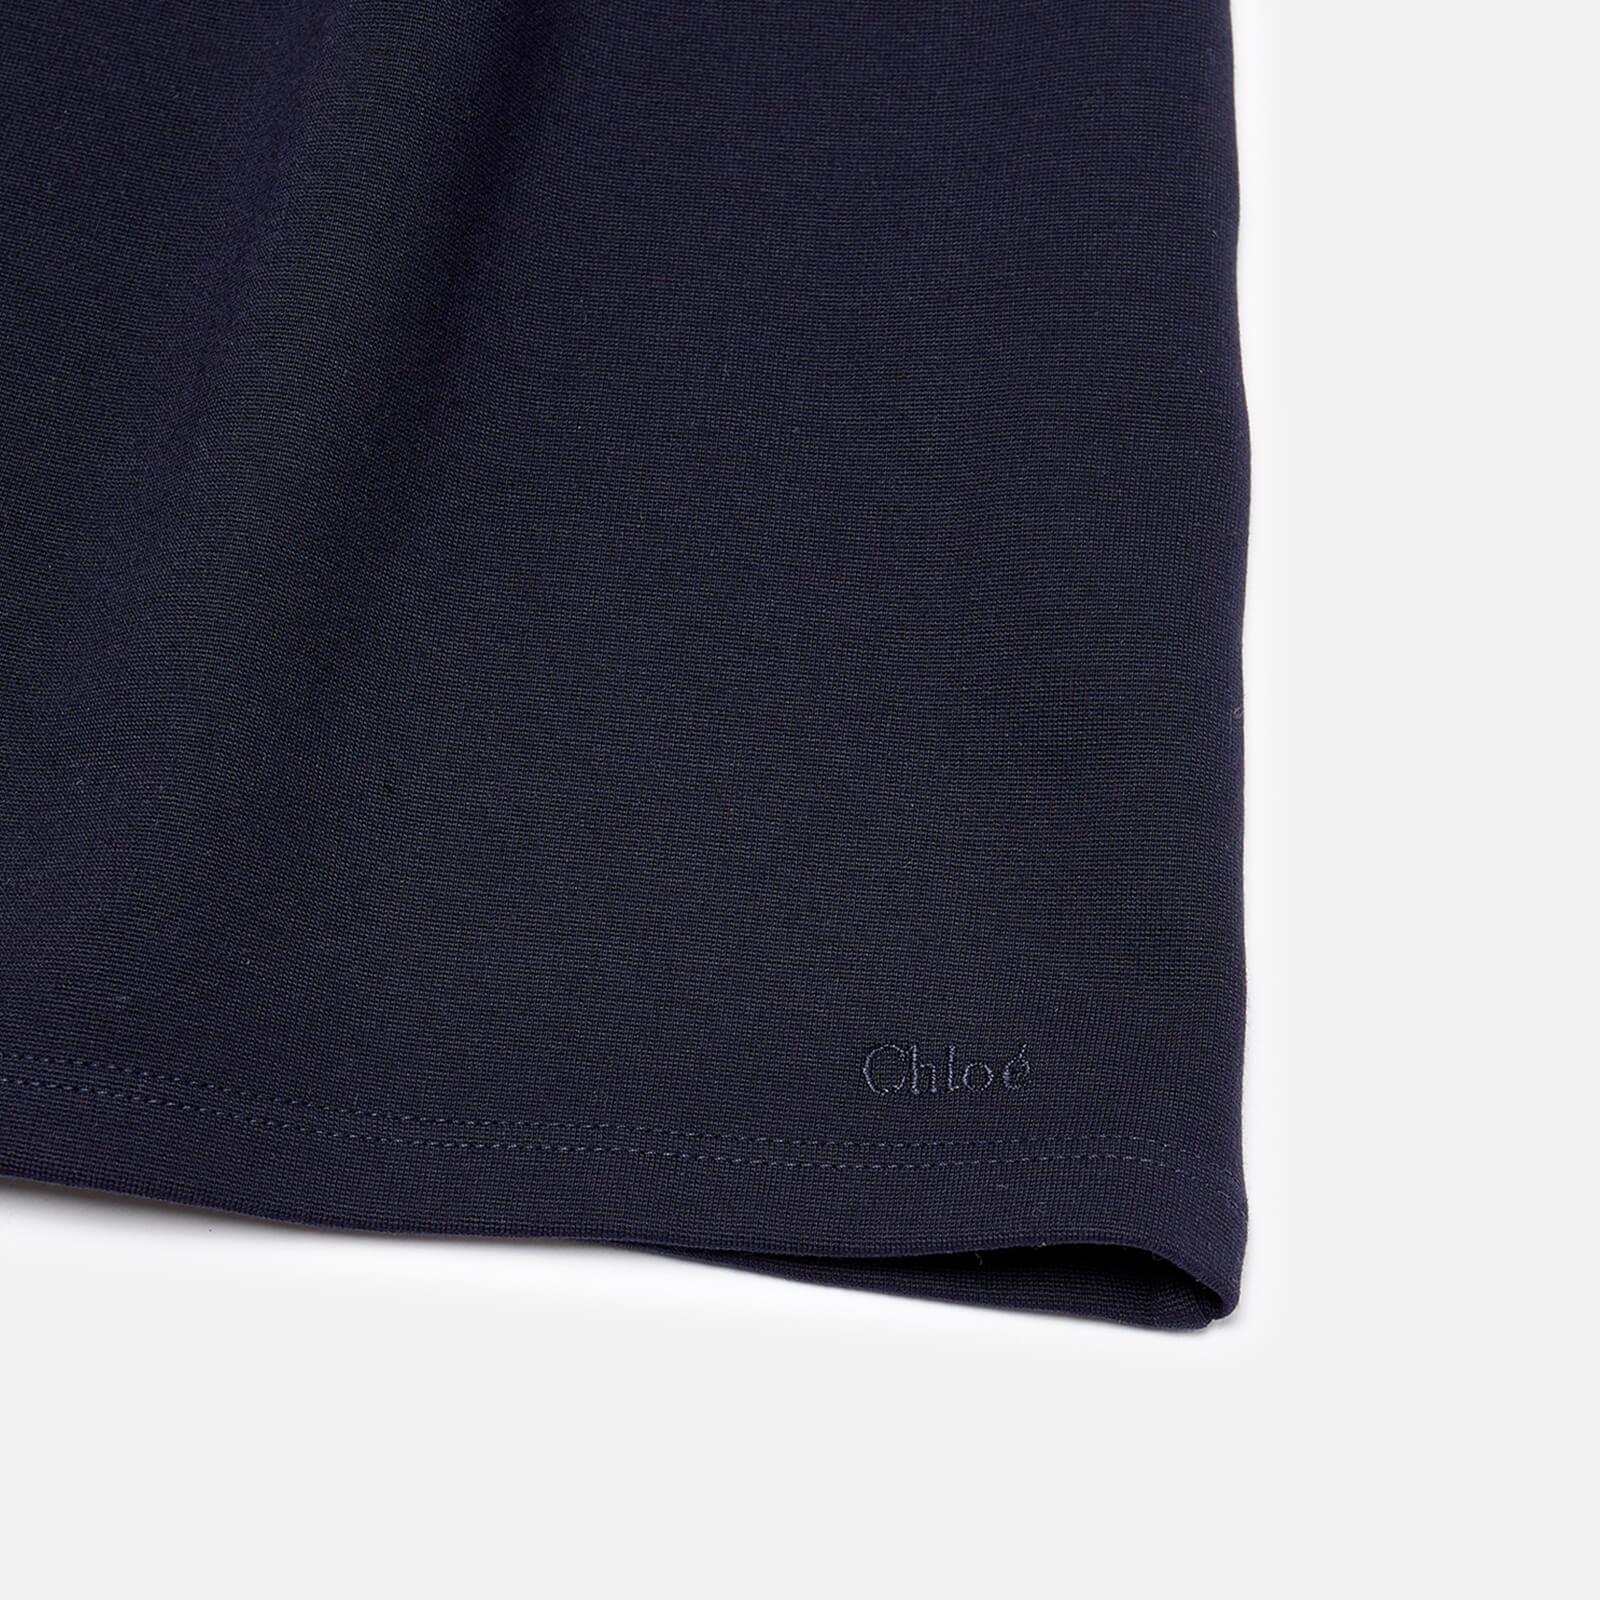 Chloé Girls' Smock Dress - Navy - 14 Years Blue C12843/859 Dresses Childrens Clothing, Blue